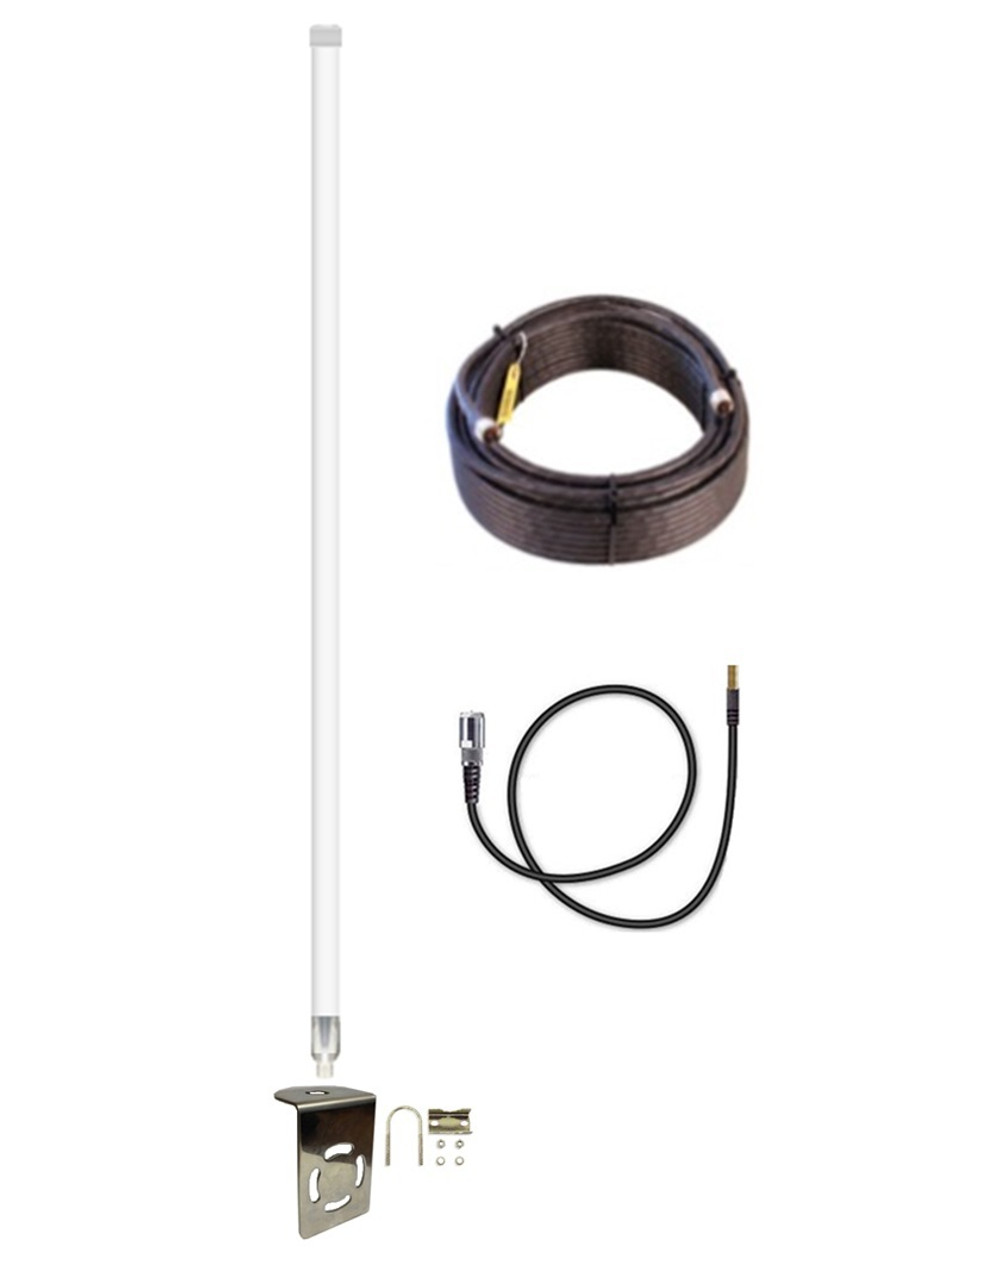 12dB Fiberglass  4G 5G LTE XLTE Antenna Kit for AT&T Netgear Nighthawk M1 MR 1100 w/ Cable Length Options.